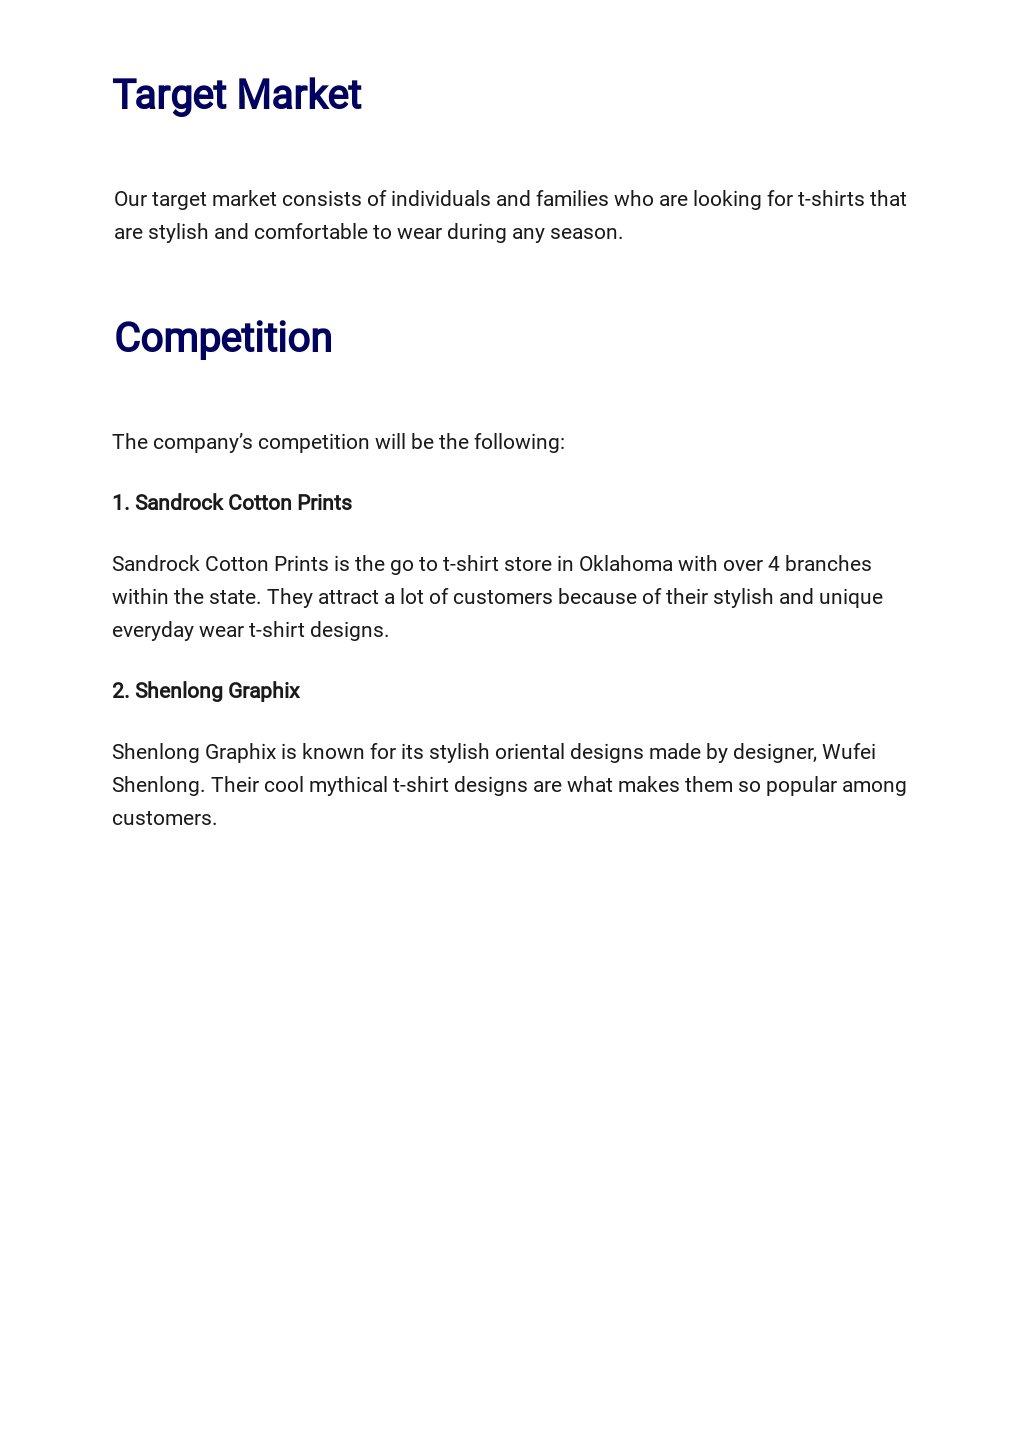 T Shirt Company Business Plan Template 2.jpe